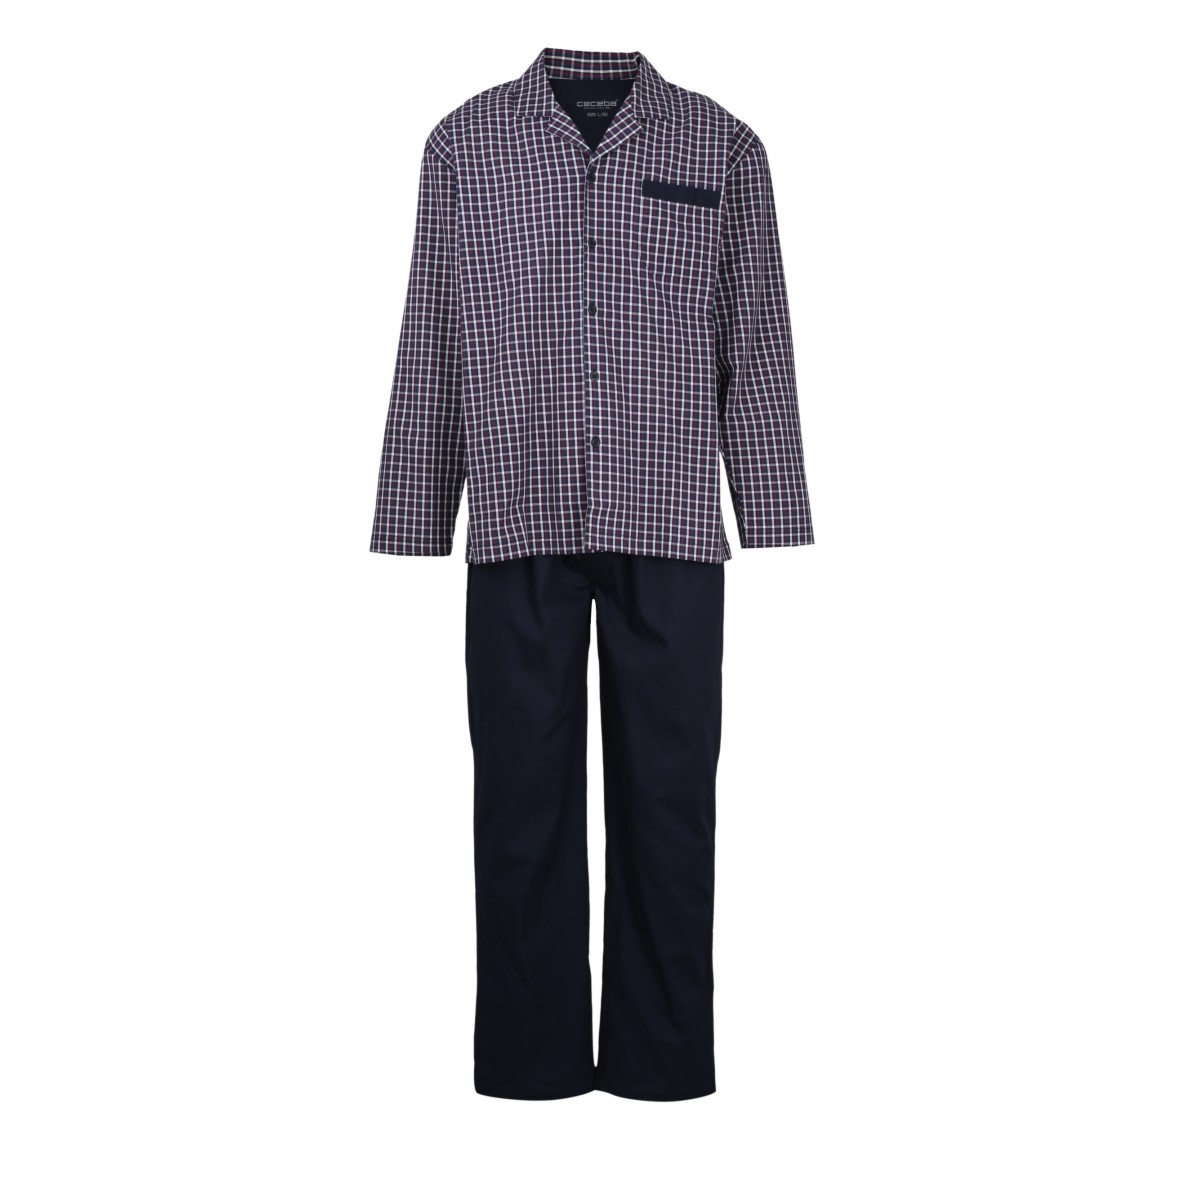 low priced fa1ea 72b2a Ceceba Herren Pyjama lang Value